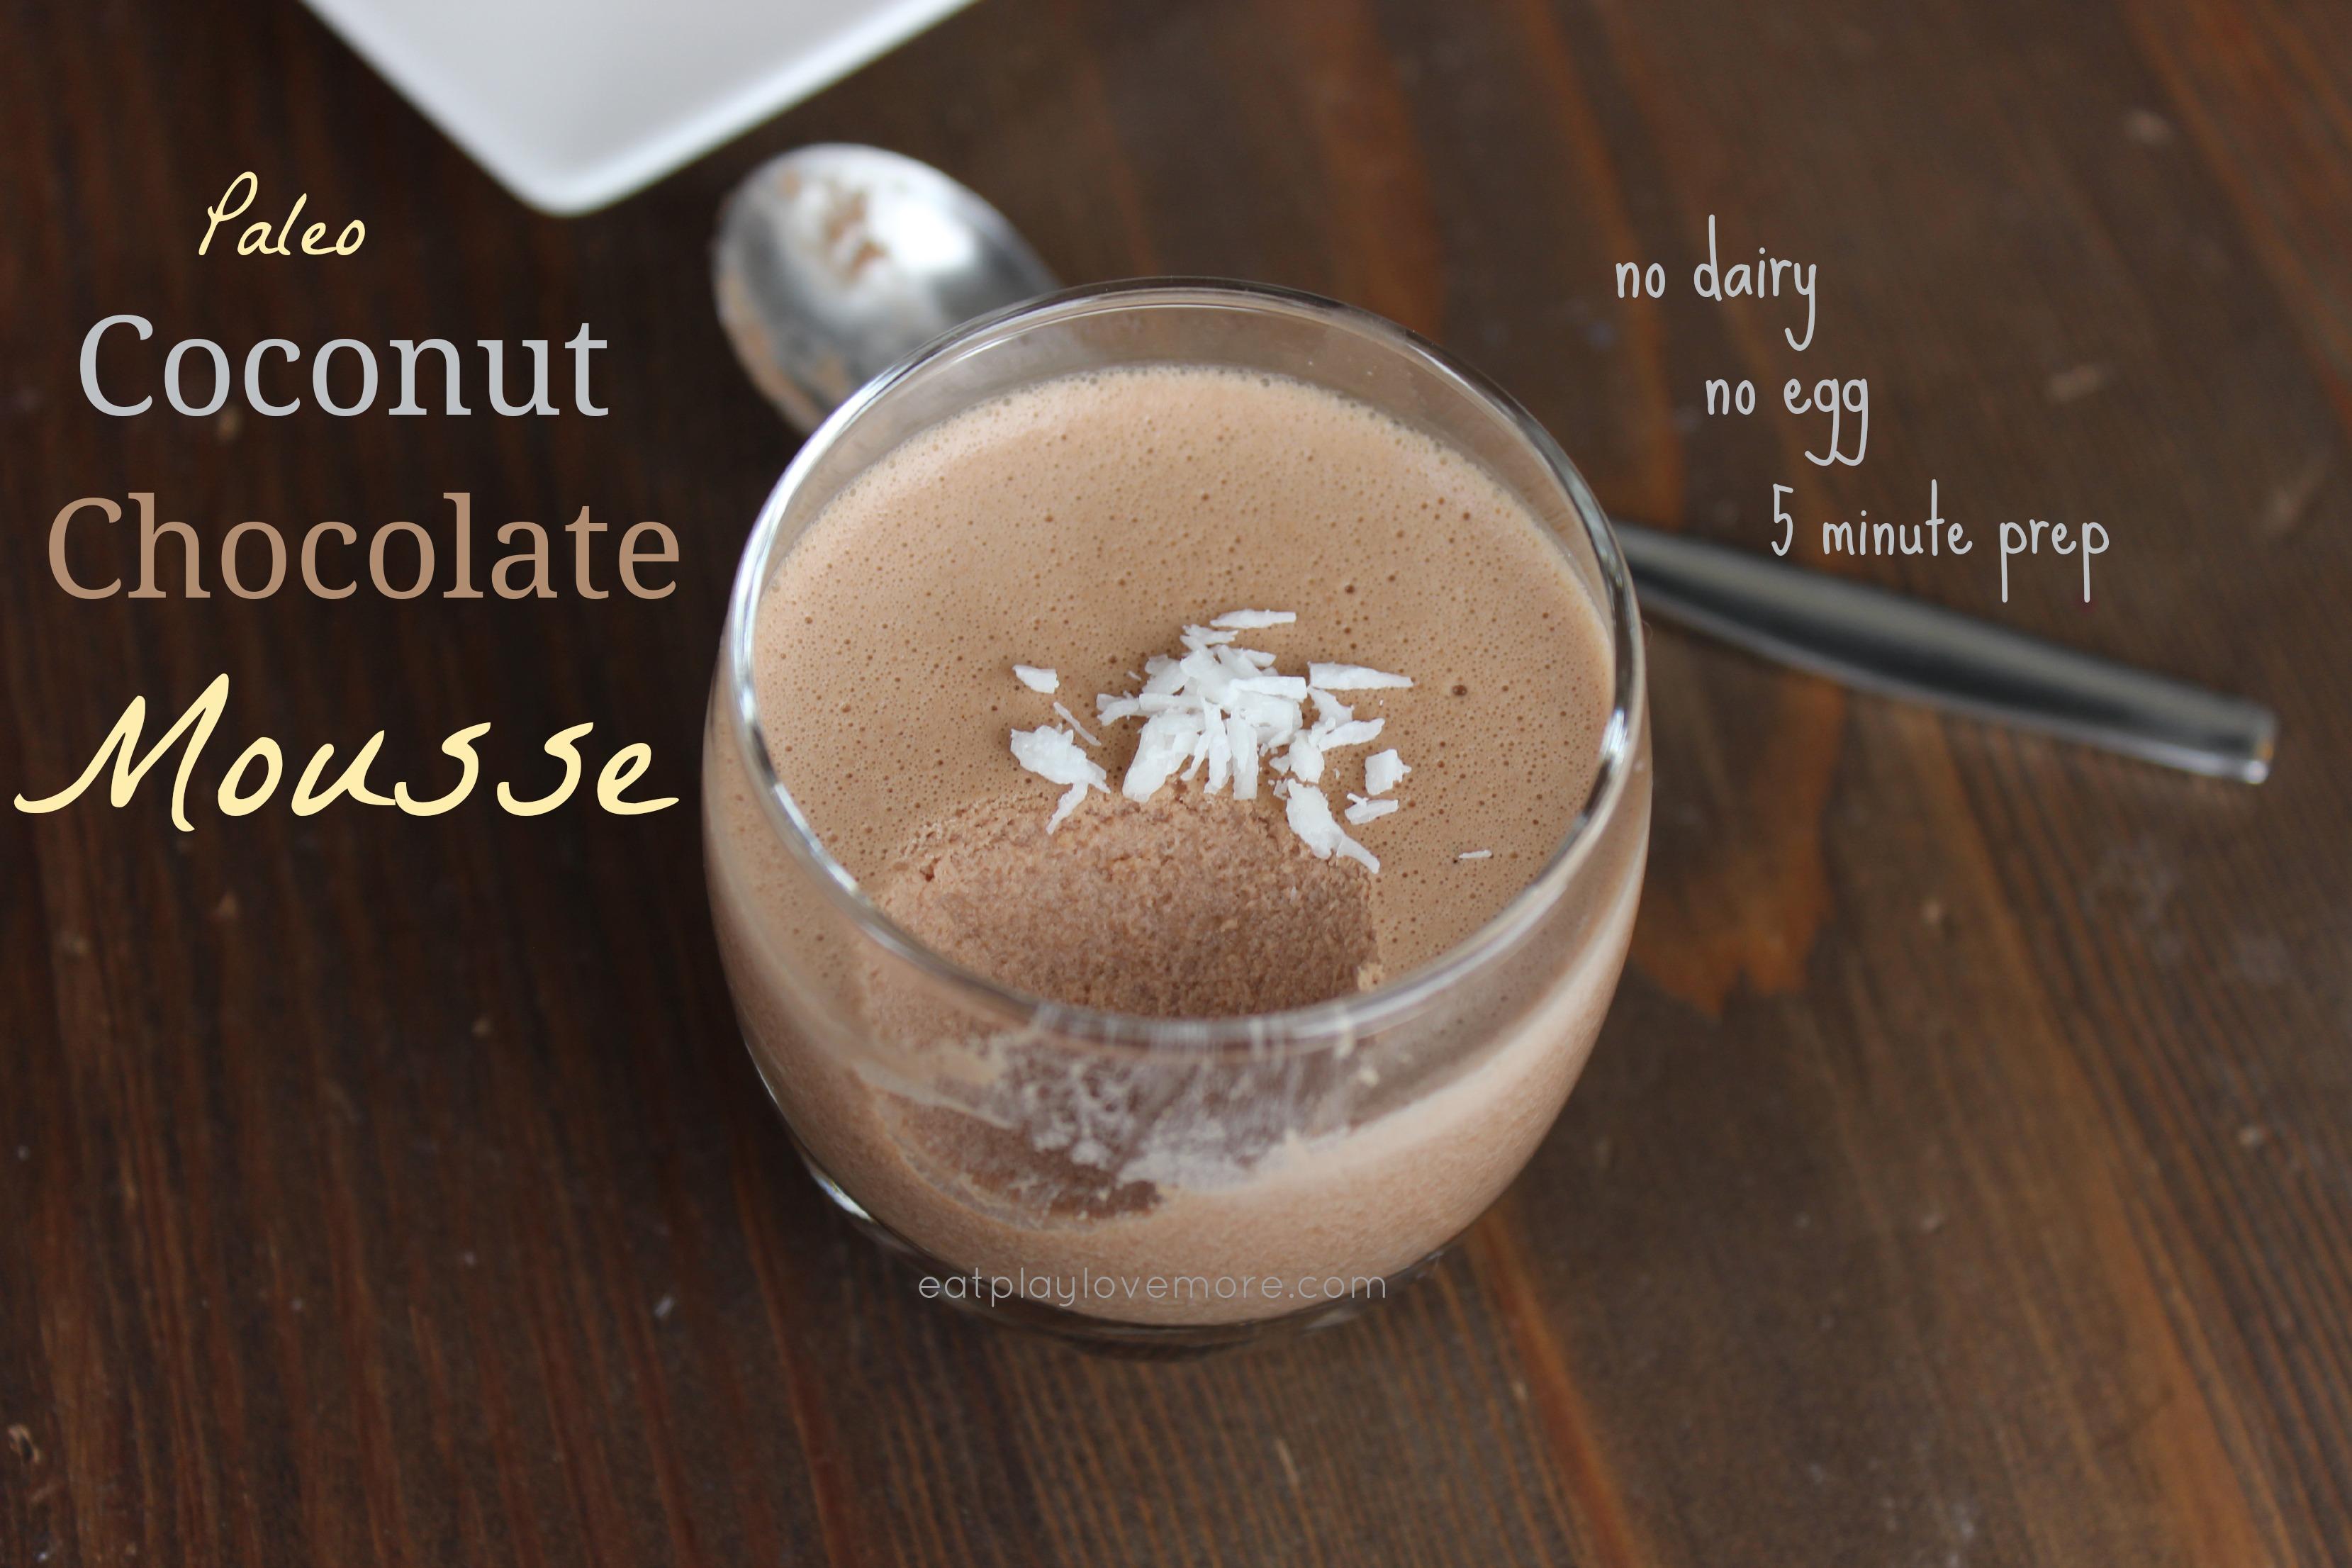 Coconut Chocolate Mousse Paleo & Primal friendly